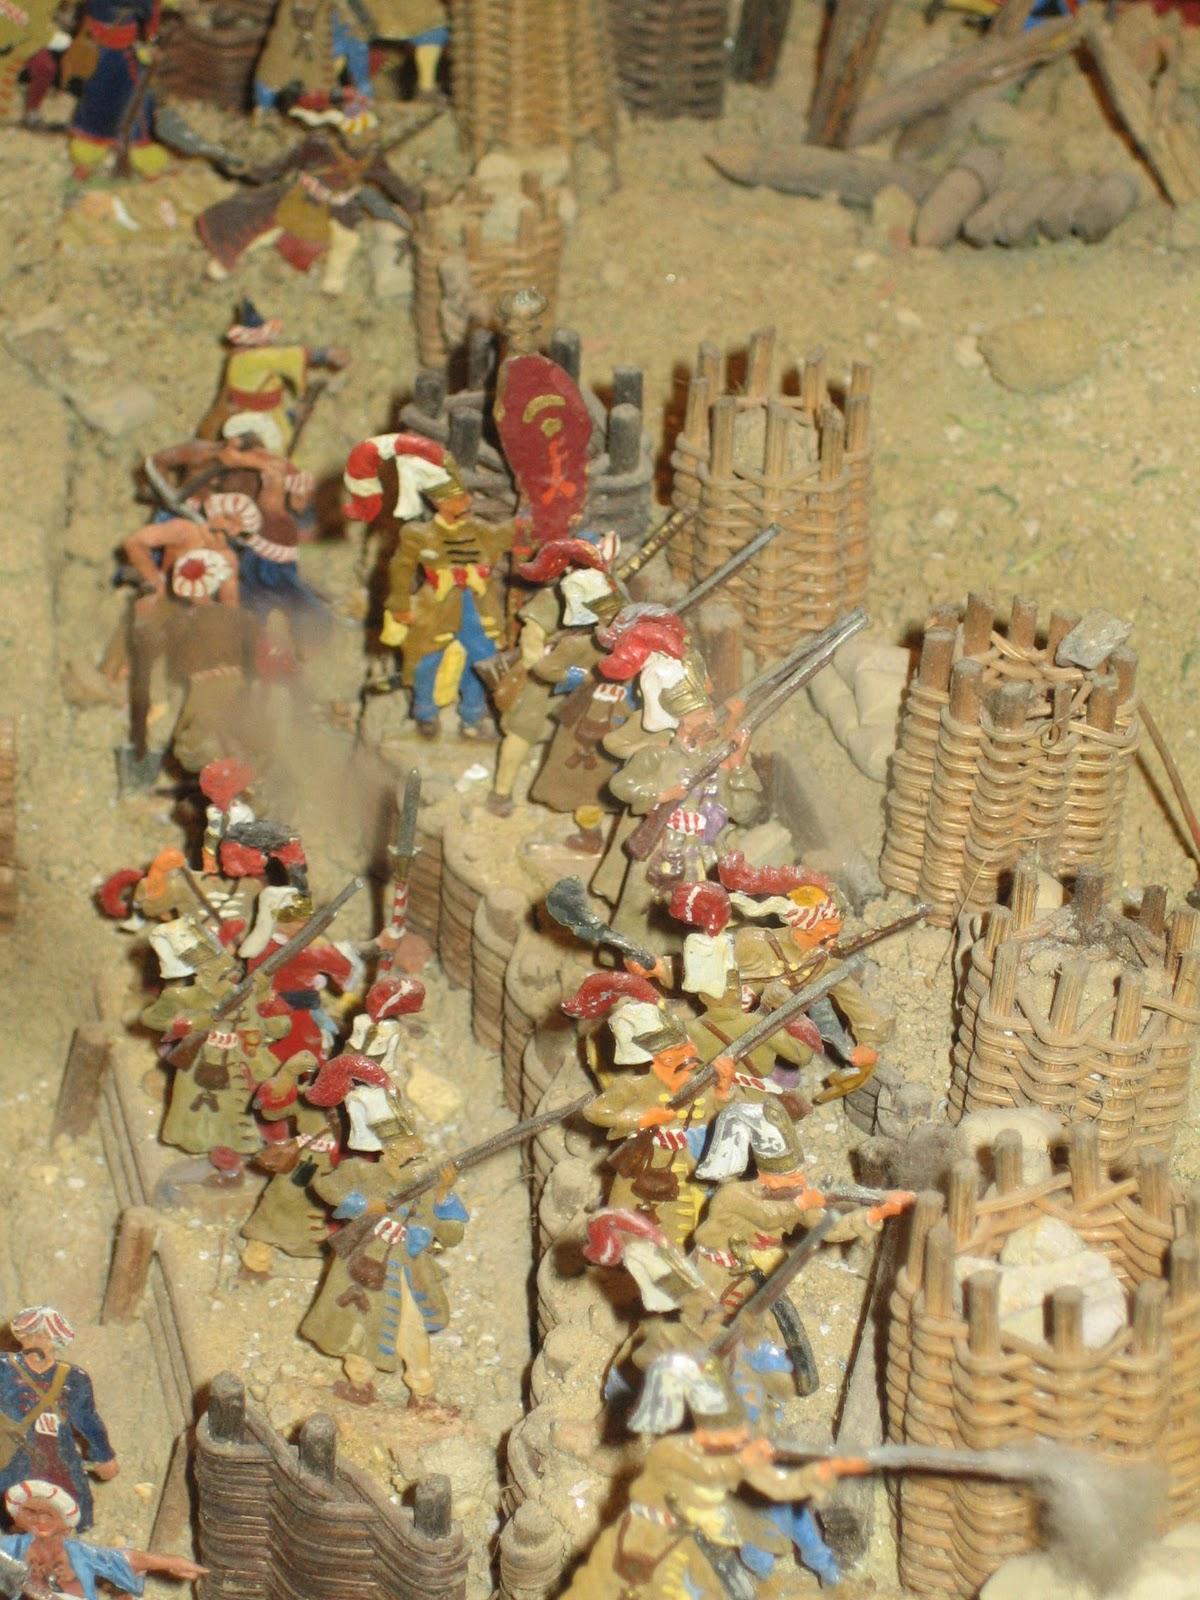 a history of the siege of vienna in 1683 The battle of vienna (german: schlacht am kahlen berge or kahlenberg polish: bitwa pod wiedniem or odsiecz wiedeńska (the relief of vienna) modern turkish: i̇kinci viyana kuşatması, ottoman turkish: beç ḳalʿası muḥāṣarası) took place at kahlenberg mountain near vienna on 12 september 1683 after the imperial city had been .